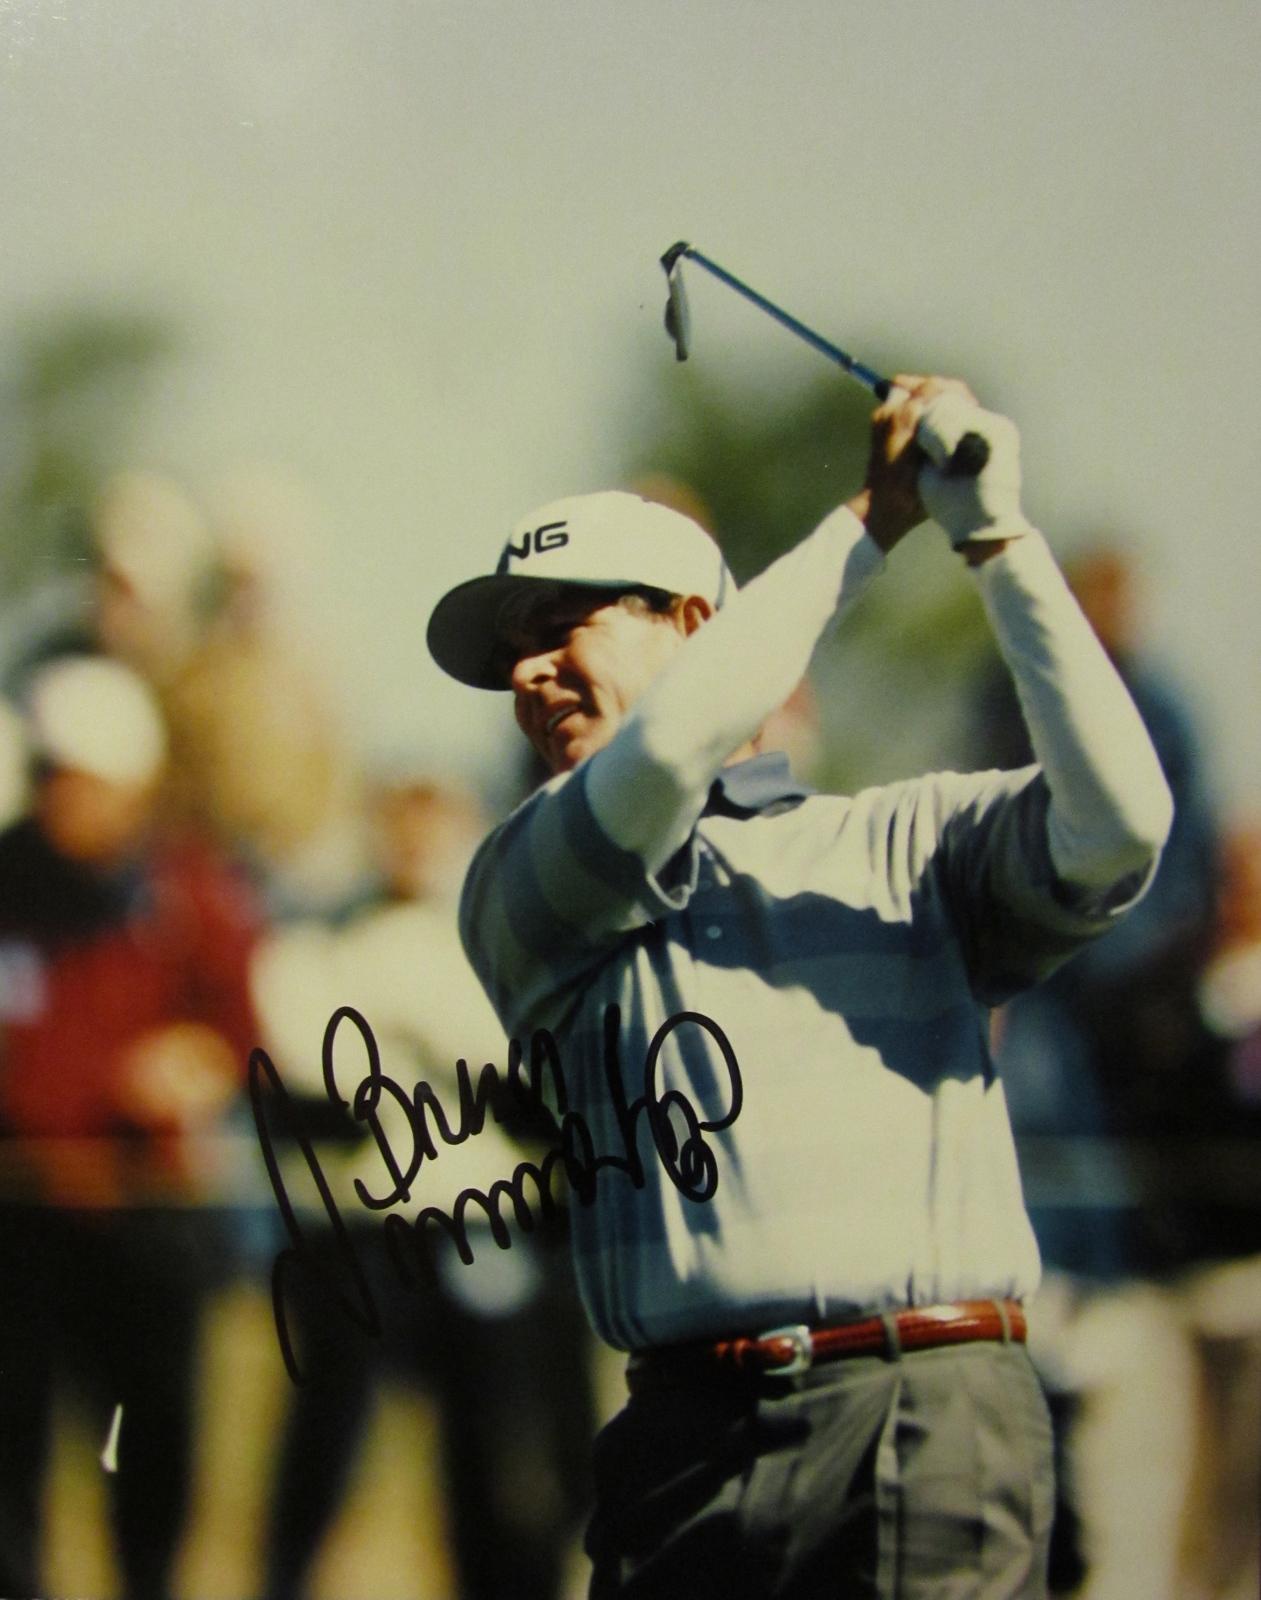 BRUCE SUMMERHAYS SIGNED AUTOGRAPHED 8X10 PHOTO COA GOLF GOLFER PGA TOUR MASTERS - $15.00